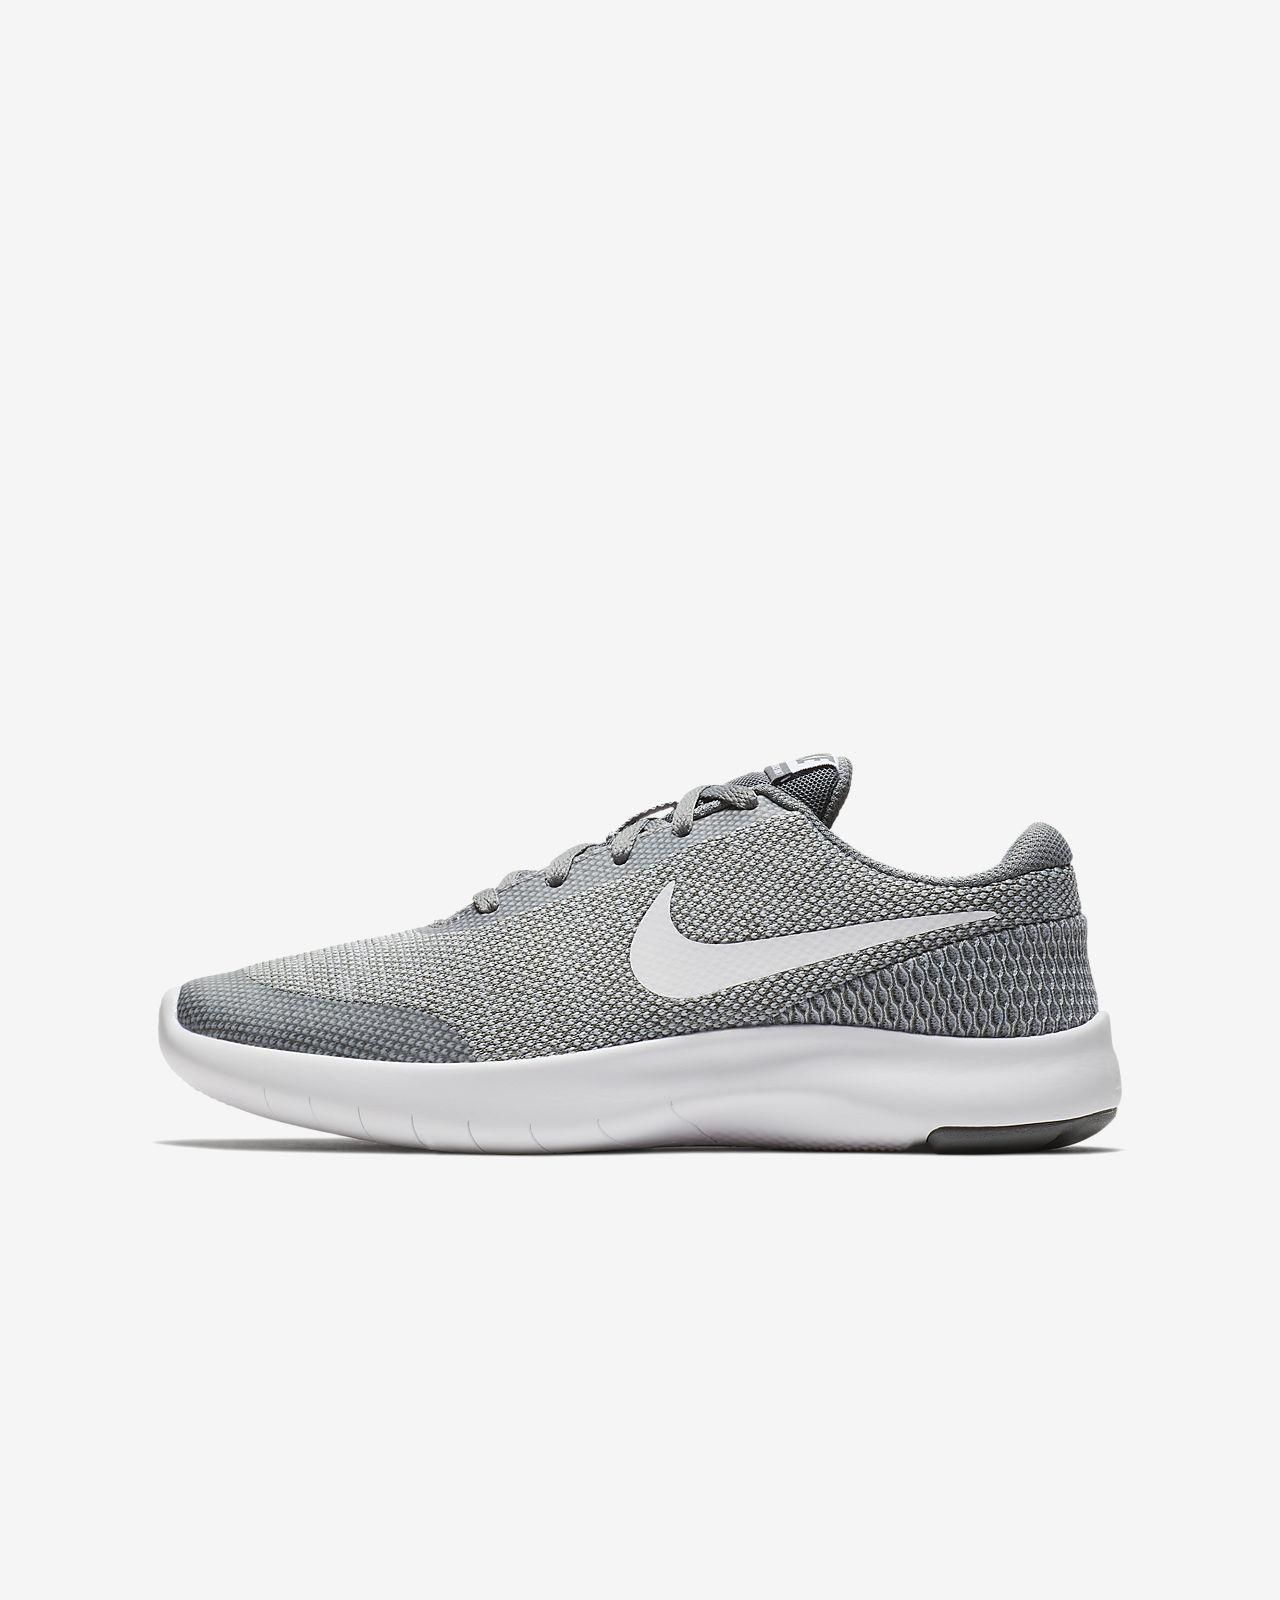 Nike Flex Experience Run 7 Zapatillas de running - Niño a. Nike.com ES 0babc4aaa5556